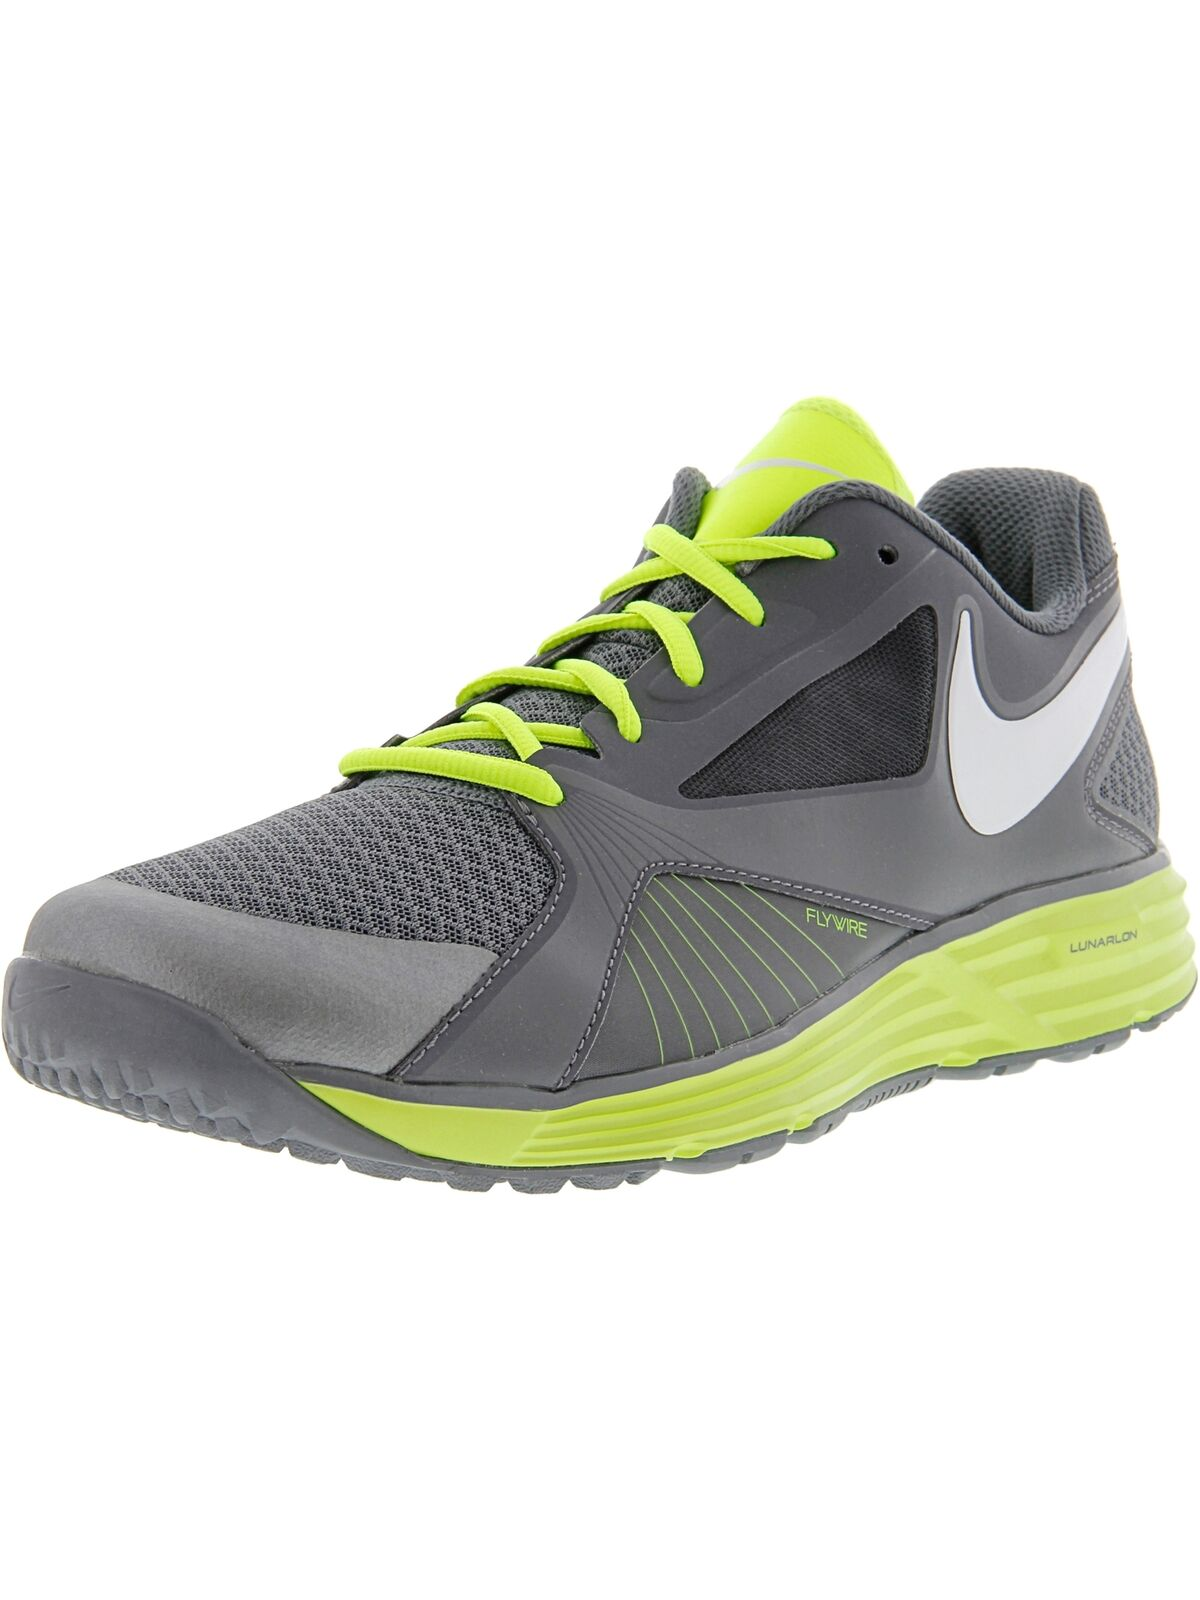 Nike Men's Lunar Edge 15 Ankle-High Training shoes